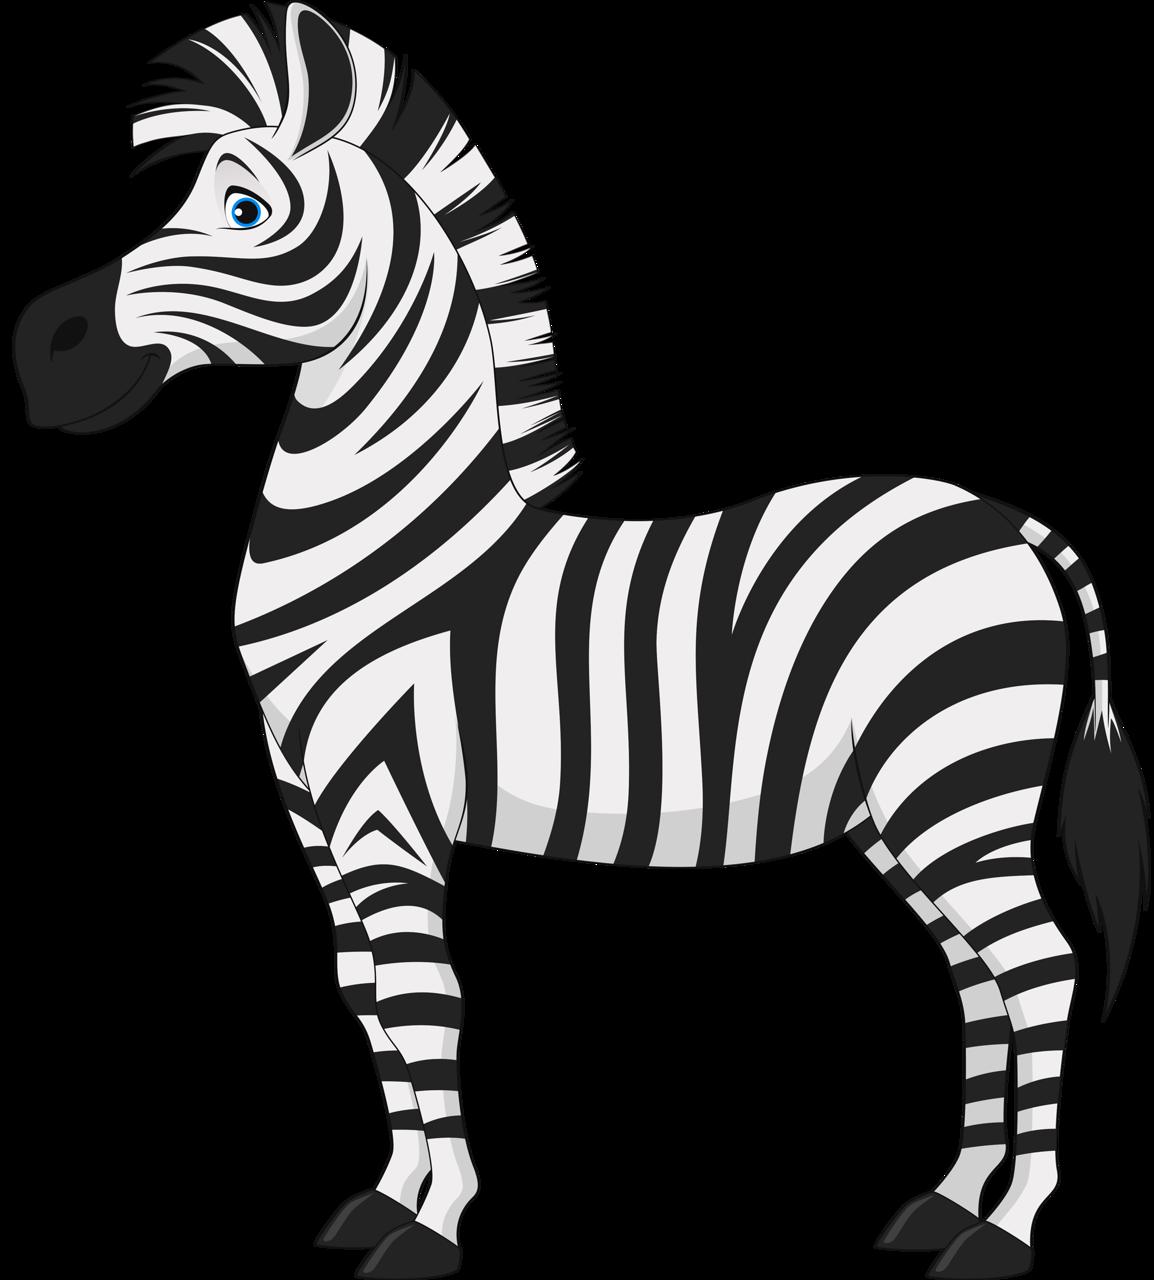 Zebra PNG, Zebra Safari, Zebra Desenho Free Download.